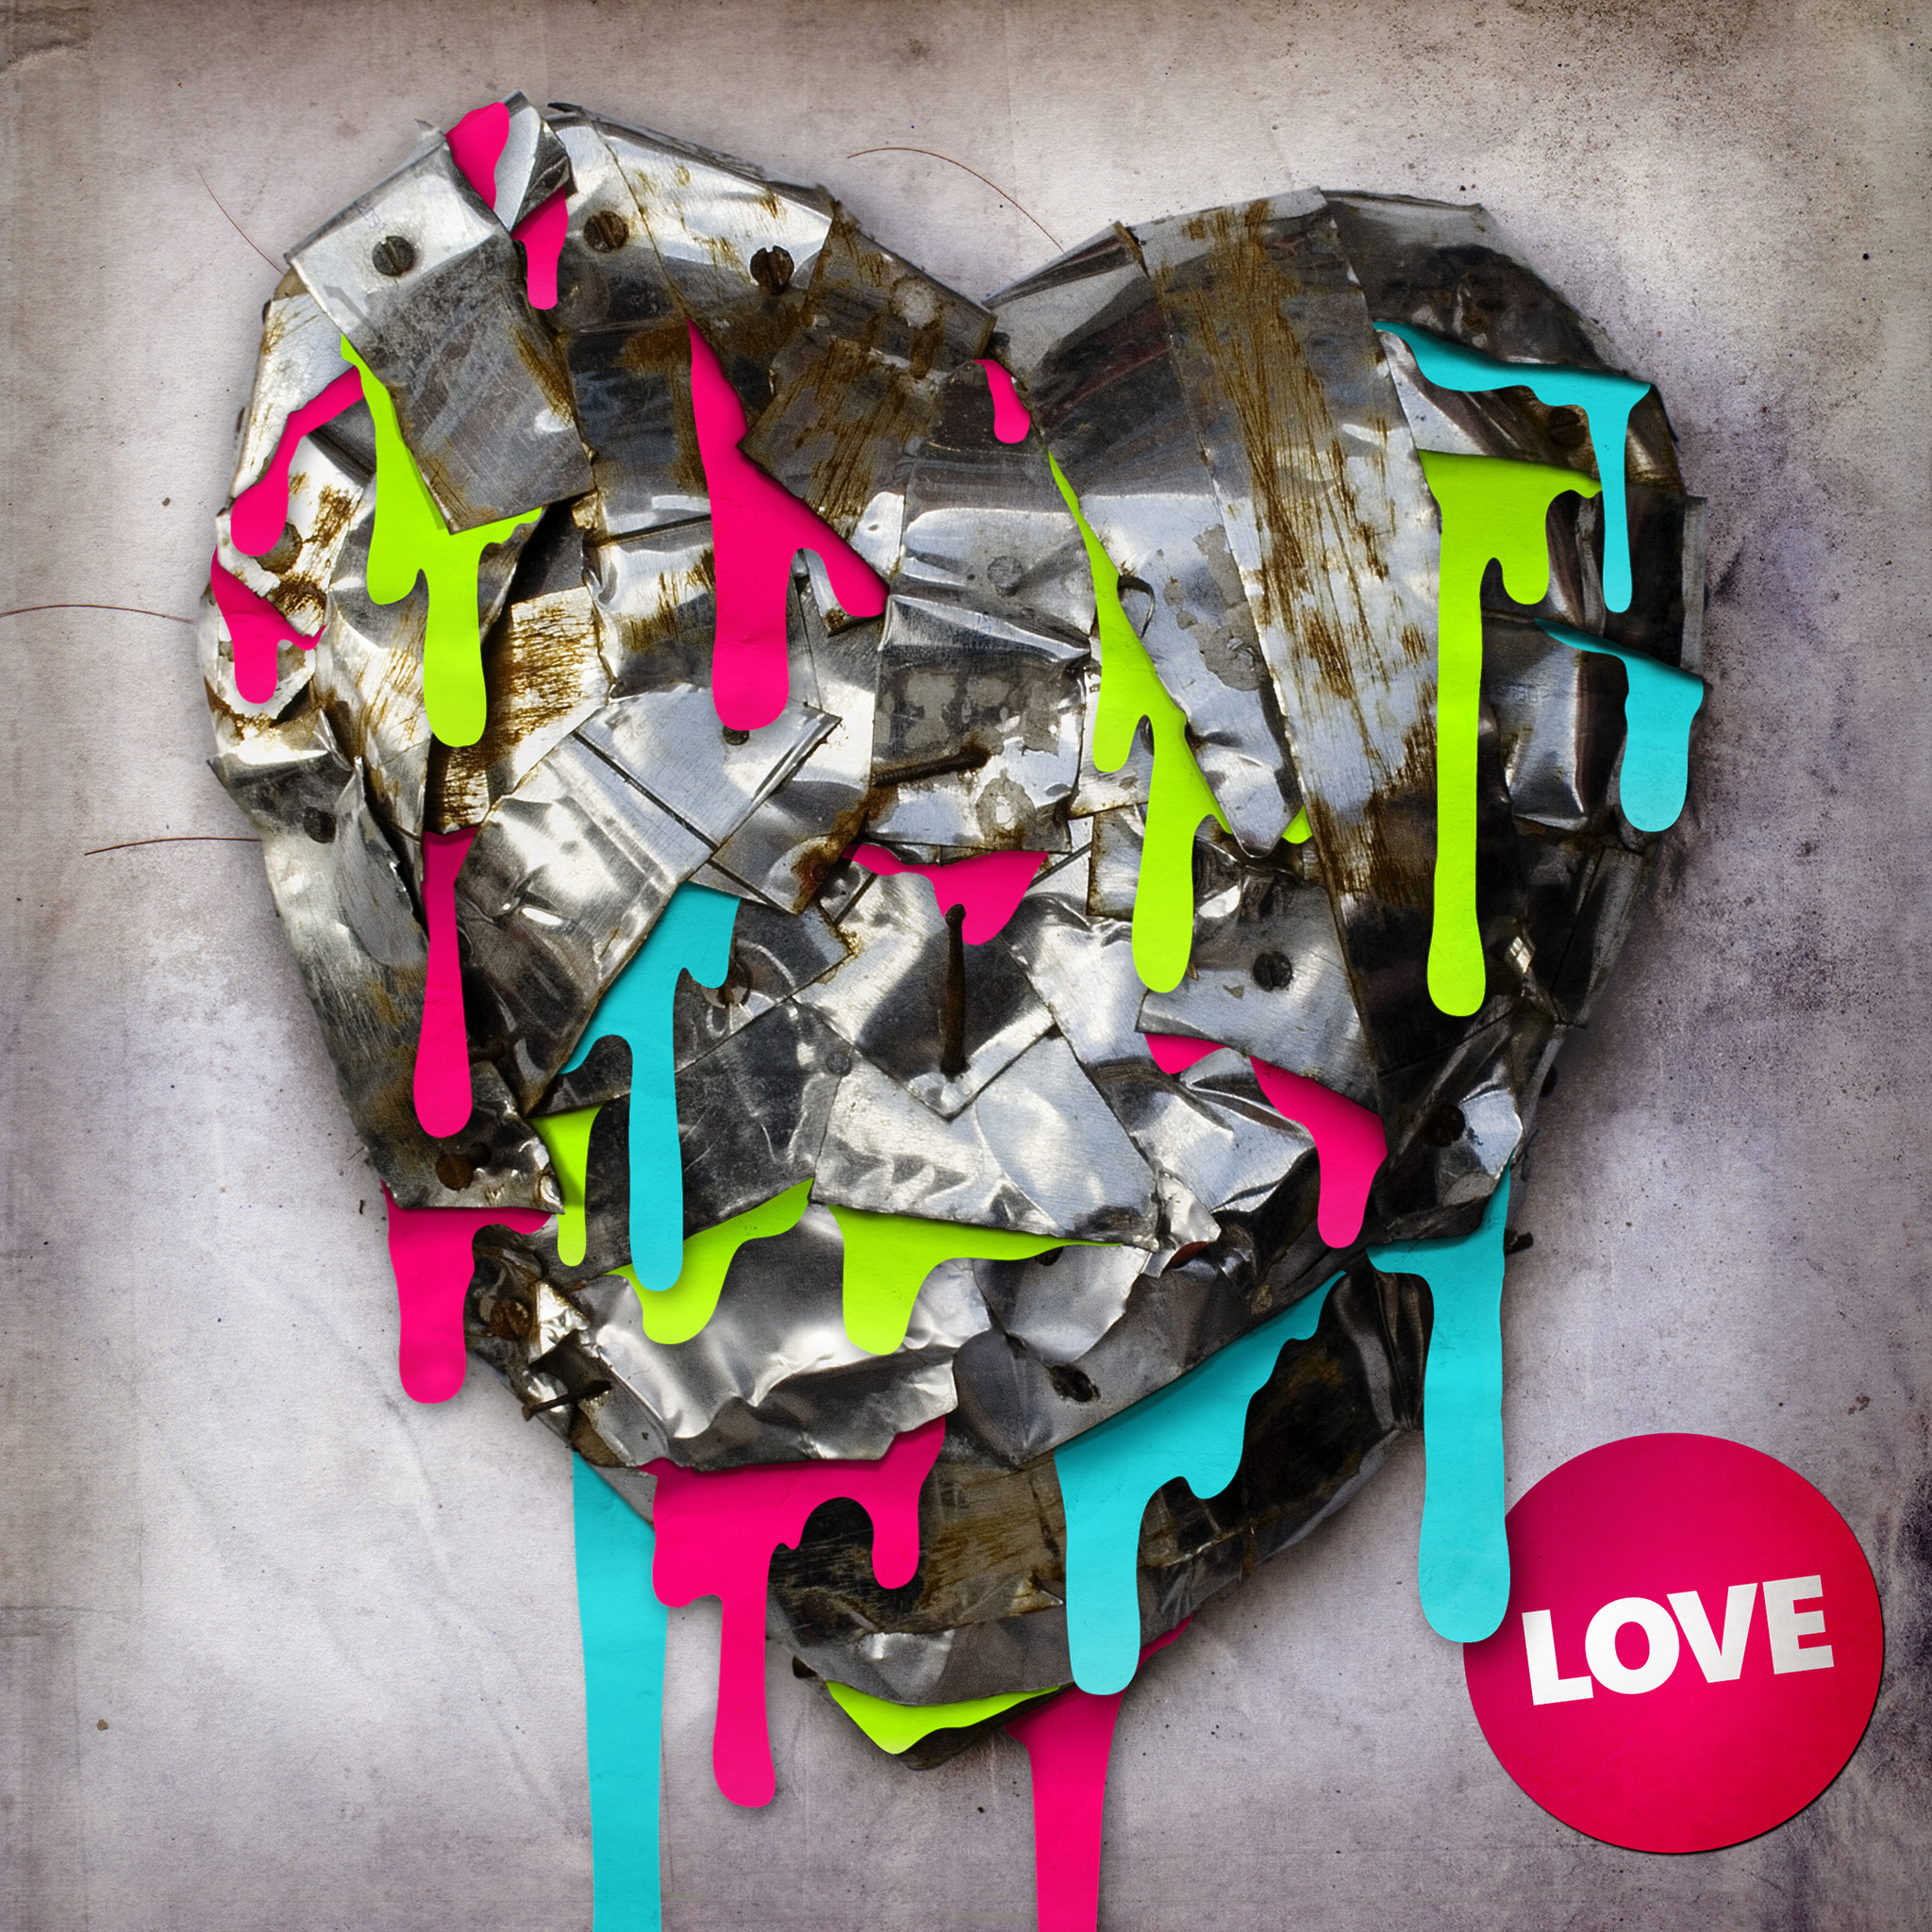 Polypunk: Love